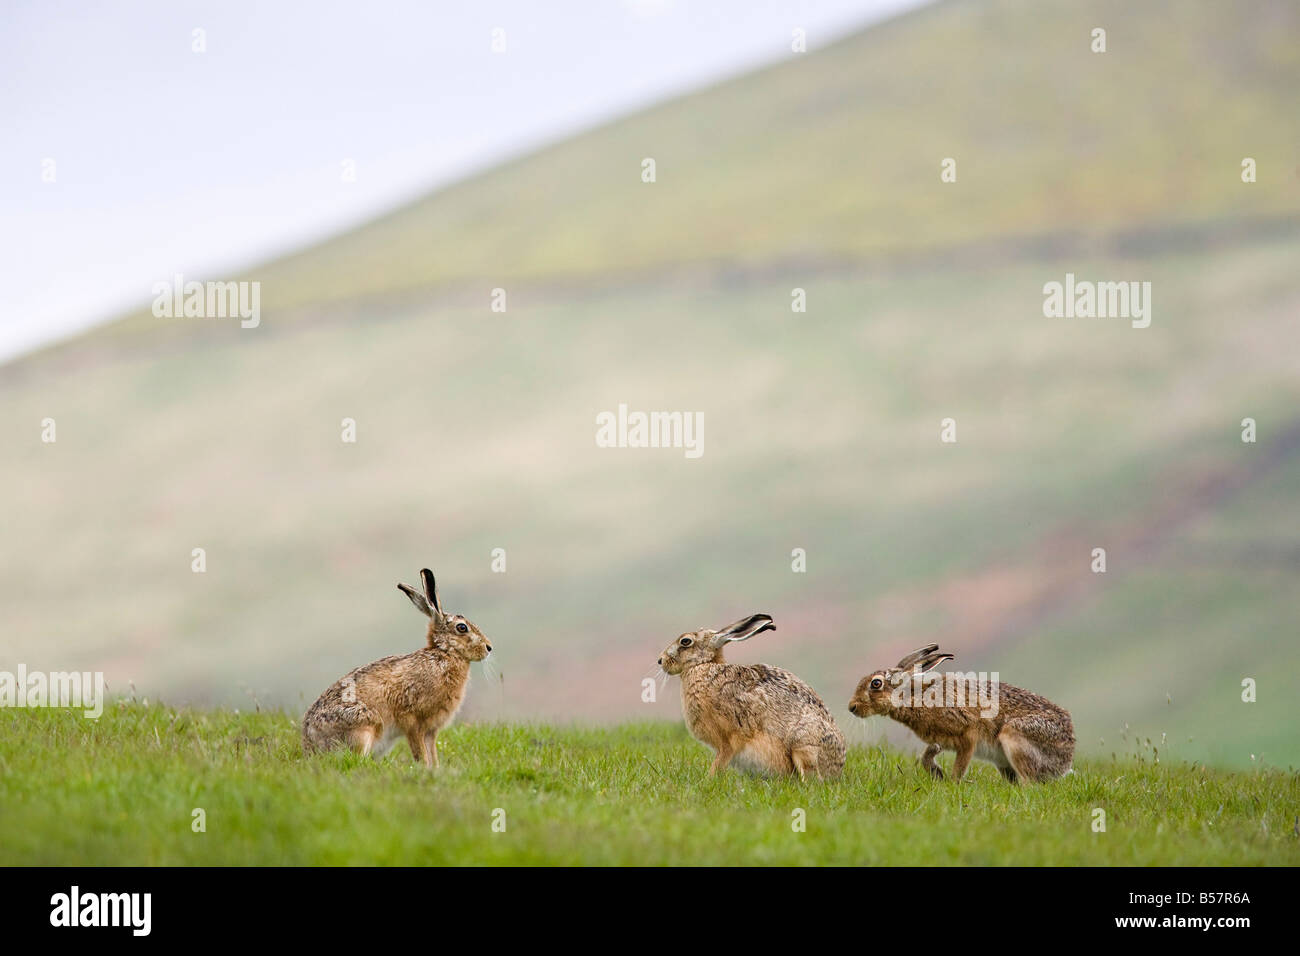 Braune Hasen (Lepus Europaeus), niedrigere Fairsnape Farm, Bleasdale, Lancashire, England, Vereinigtes Königreich, Stockbild